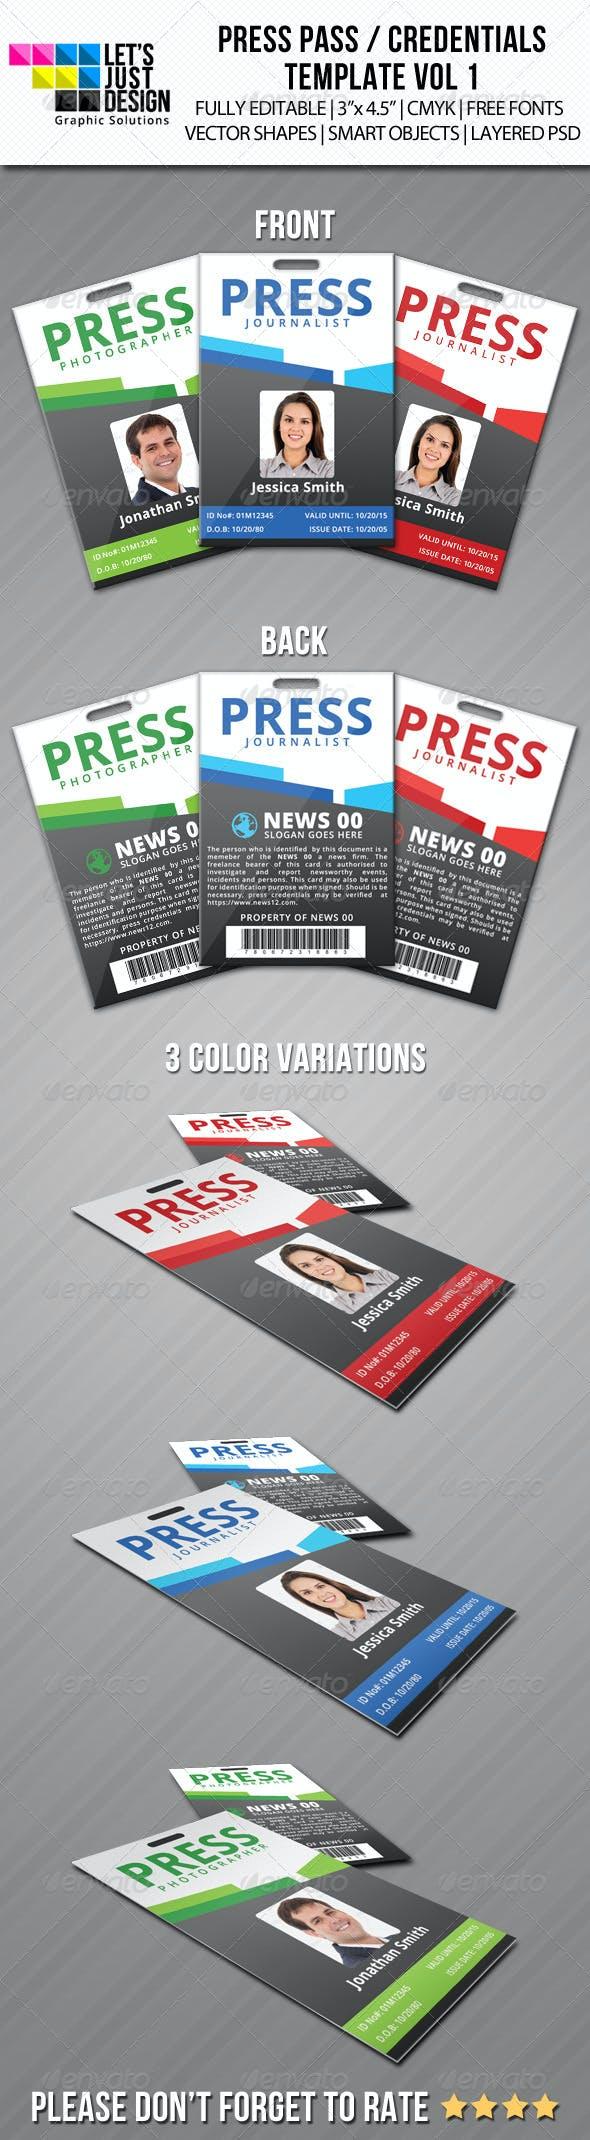 press pass credentials template vol 1